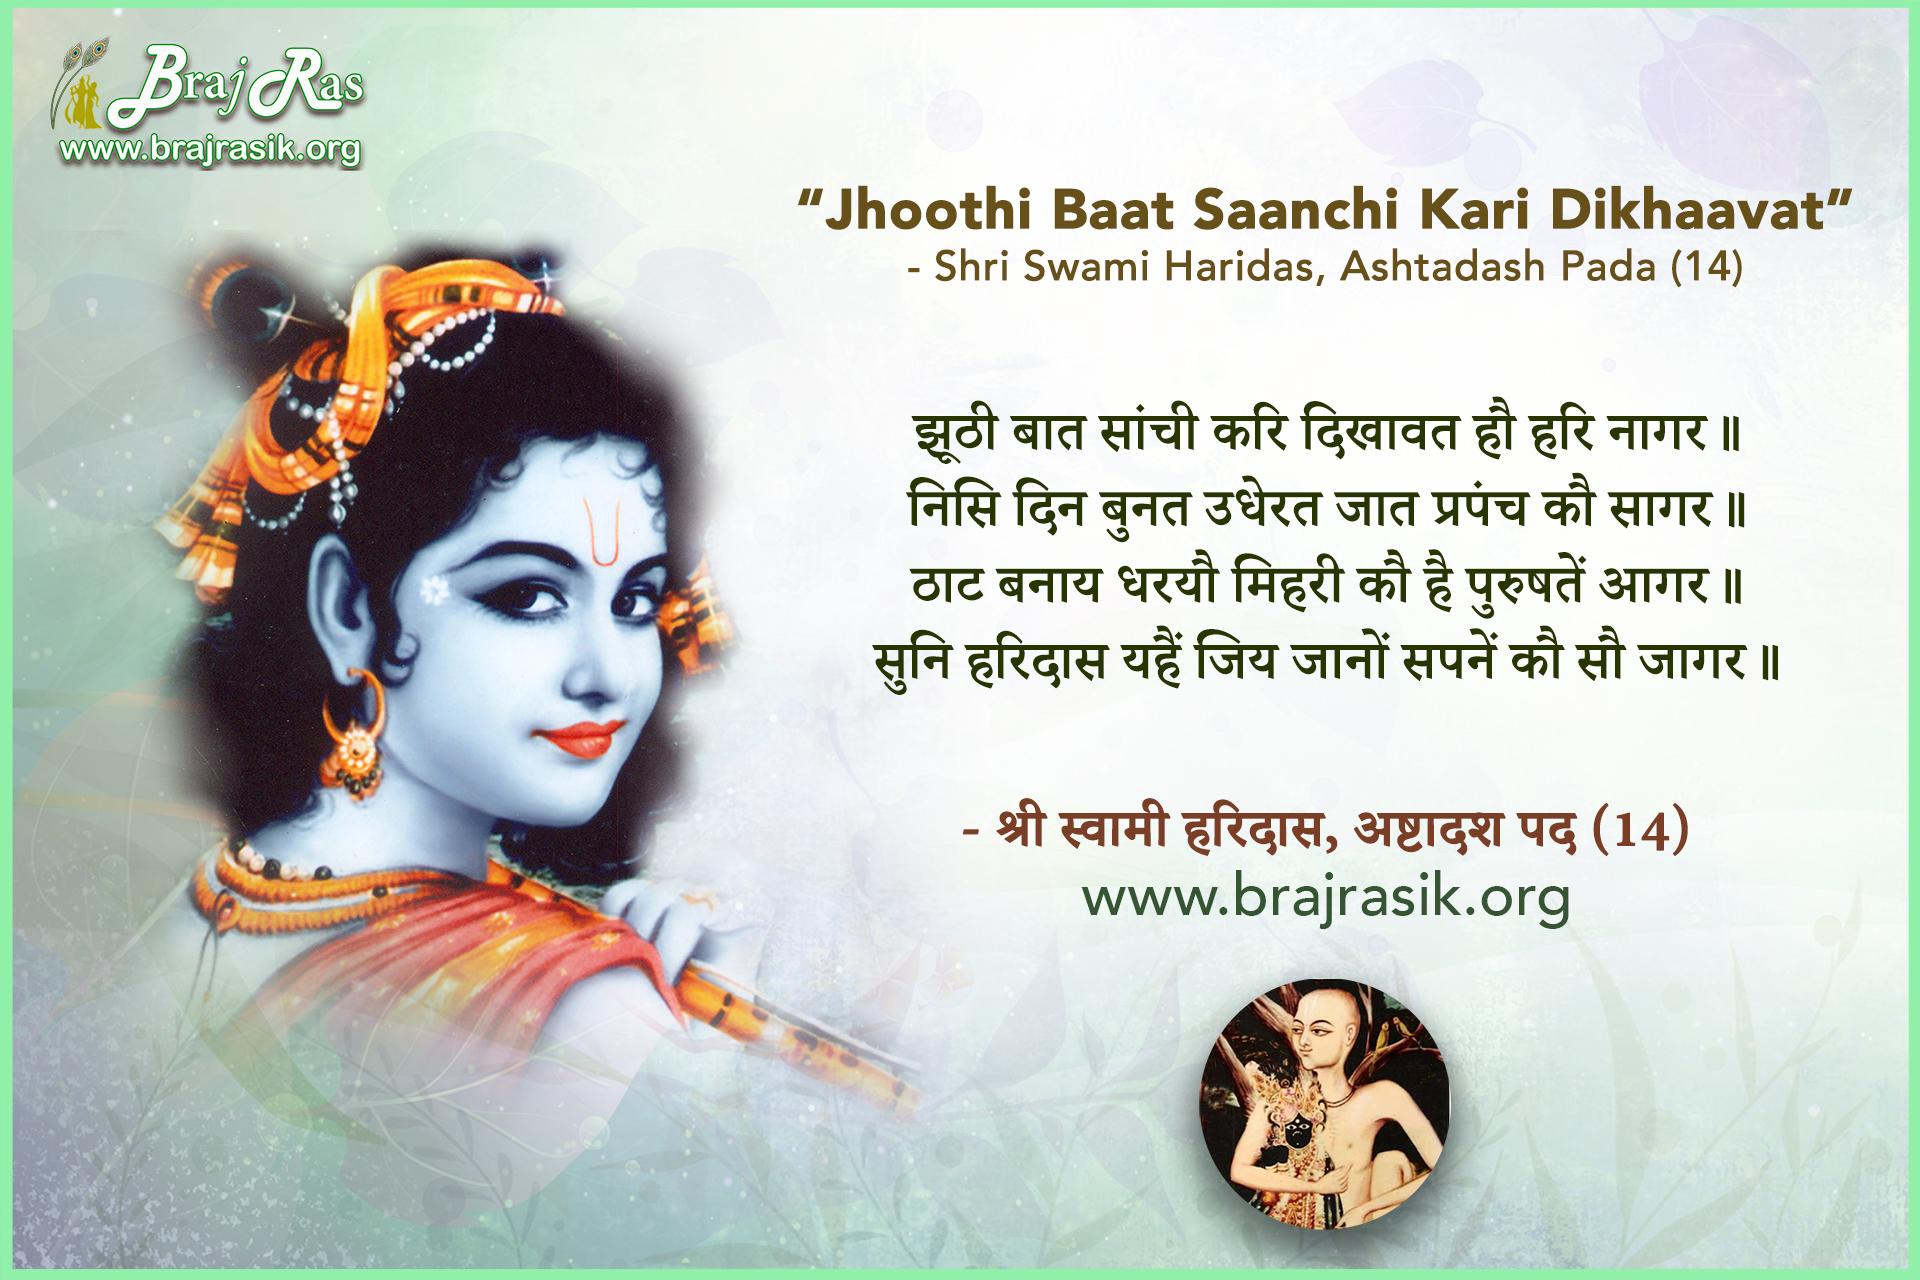 Jhoothi Baat Saanchi Kari Dikhaavat - Shri Swami Haridas, Ashtadash Pad (14)